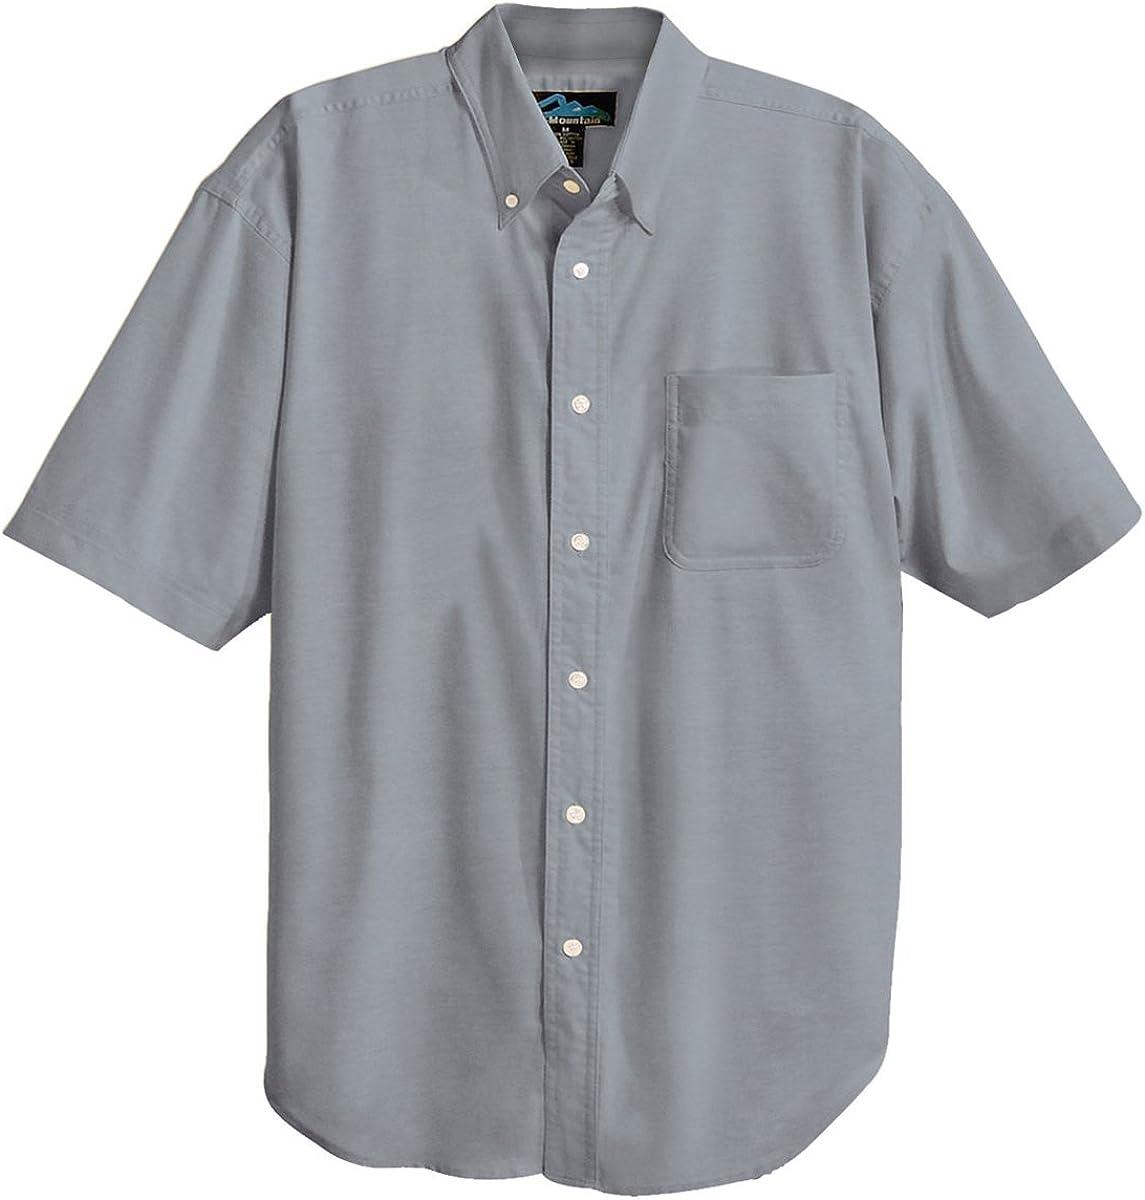 Tri-Mountain Men's DuPont Teflon Stain-Resistant Dress Shirt. 748 Retro